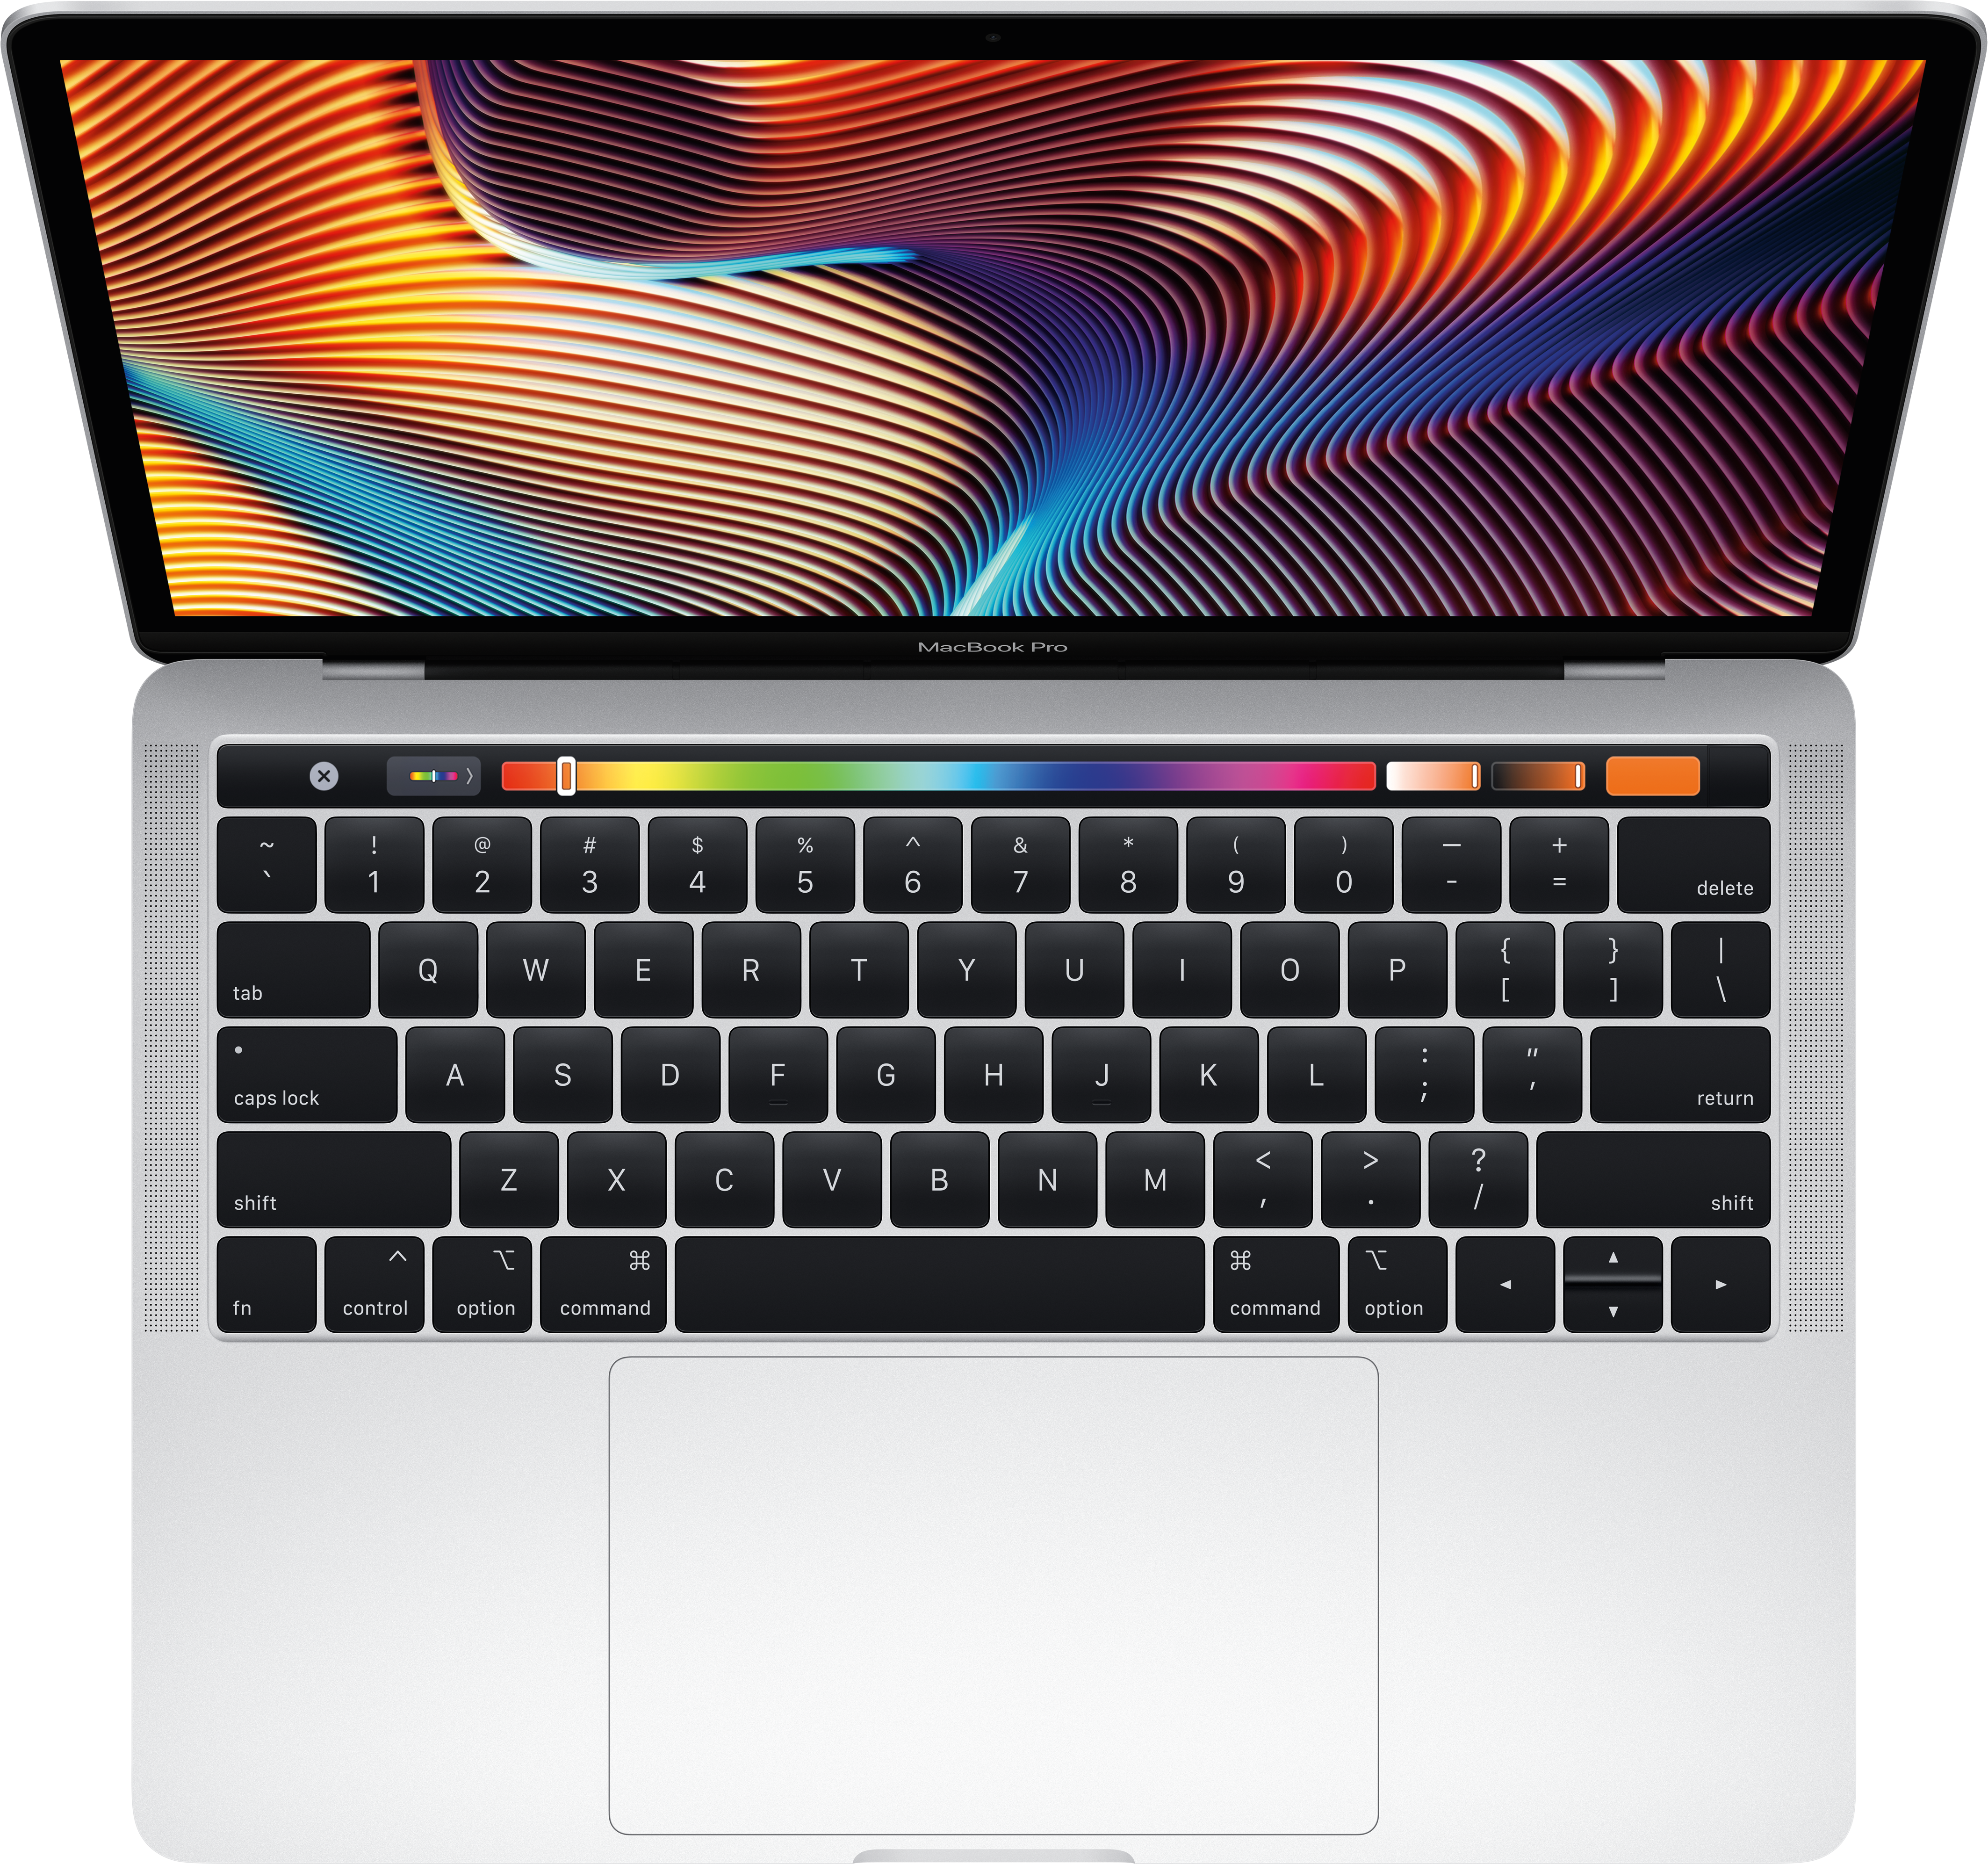 Купить MacBook Pro 13 с Touch Bar, 8 ГБ, 512 ГБ, Intel Core i5, Серебристый, APPLE